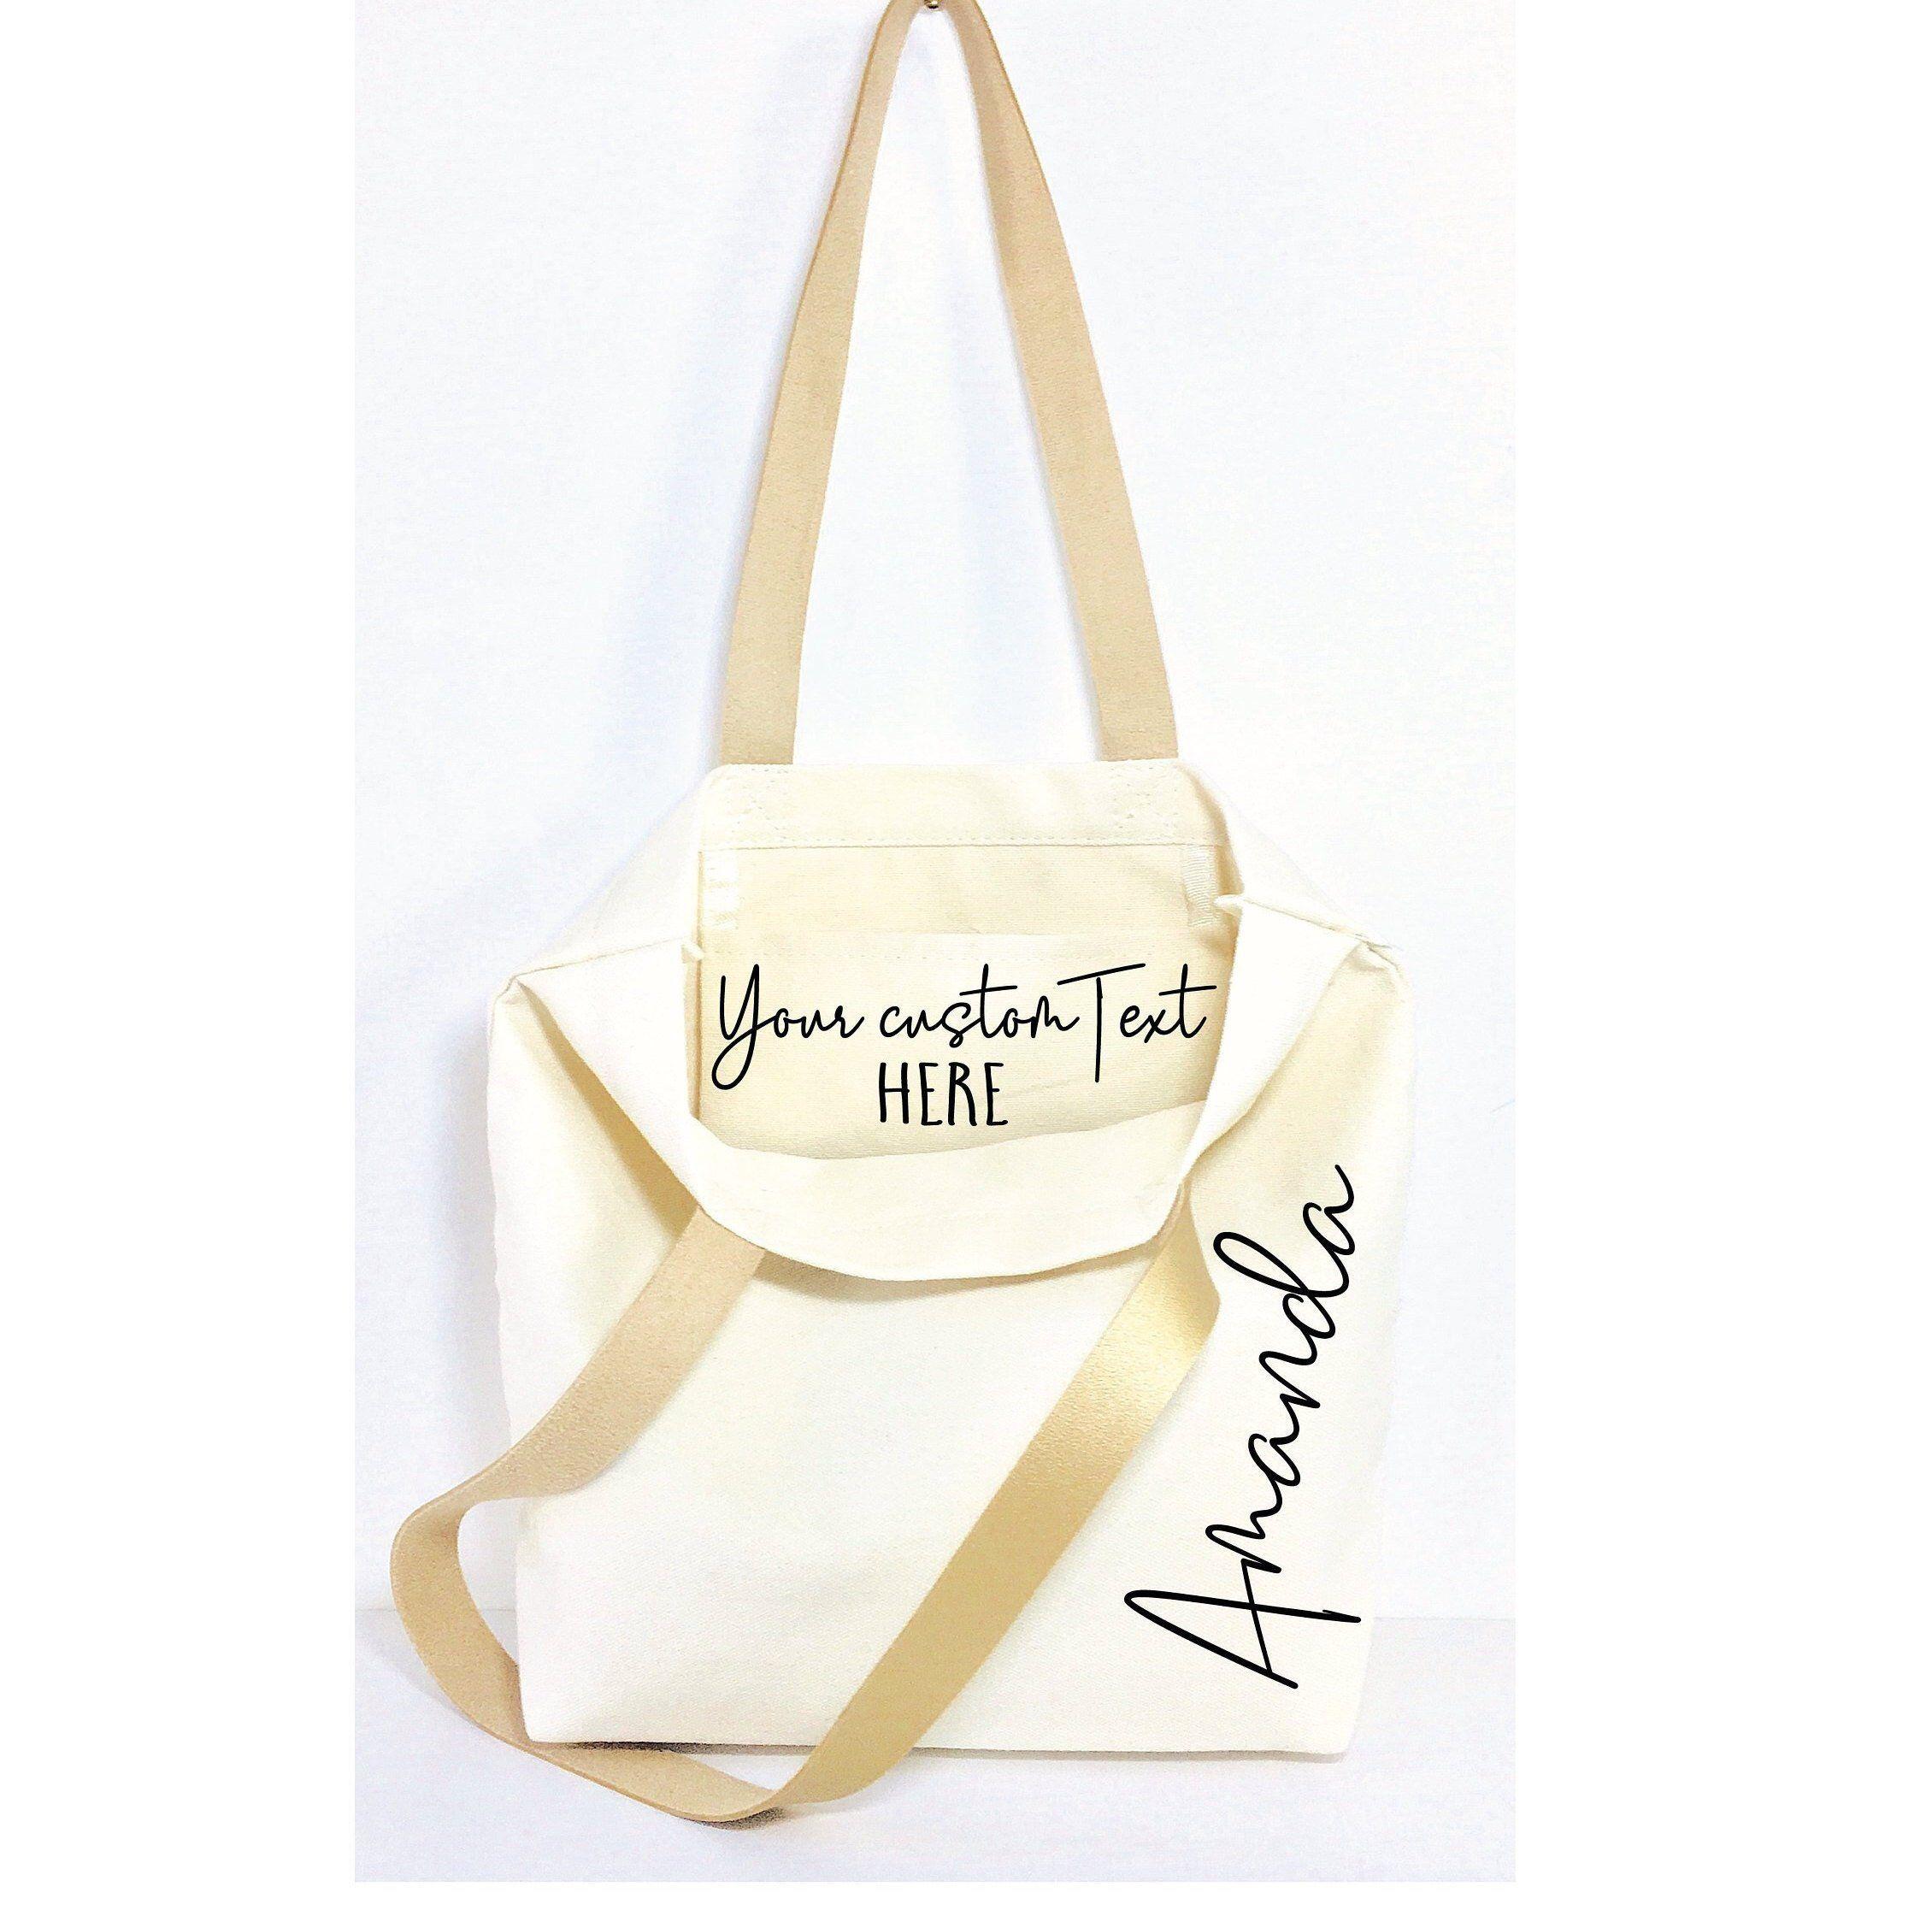 Christmas custom bags gifts ideas personalized handbags